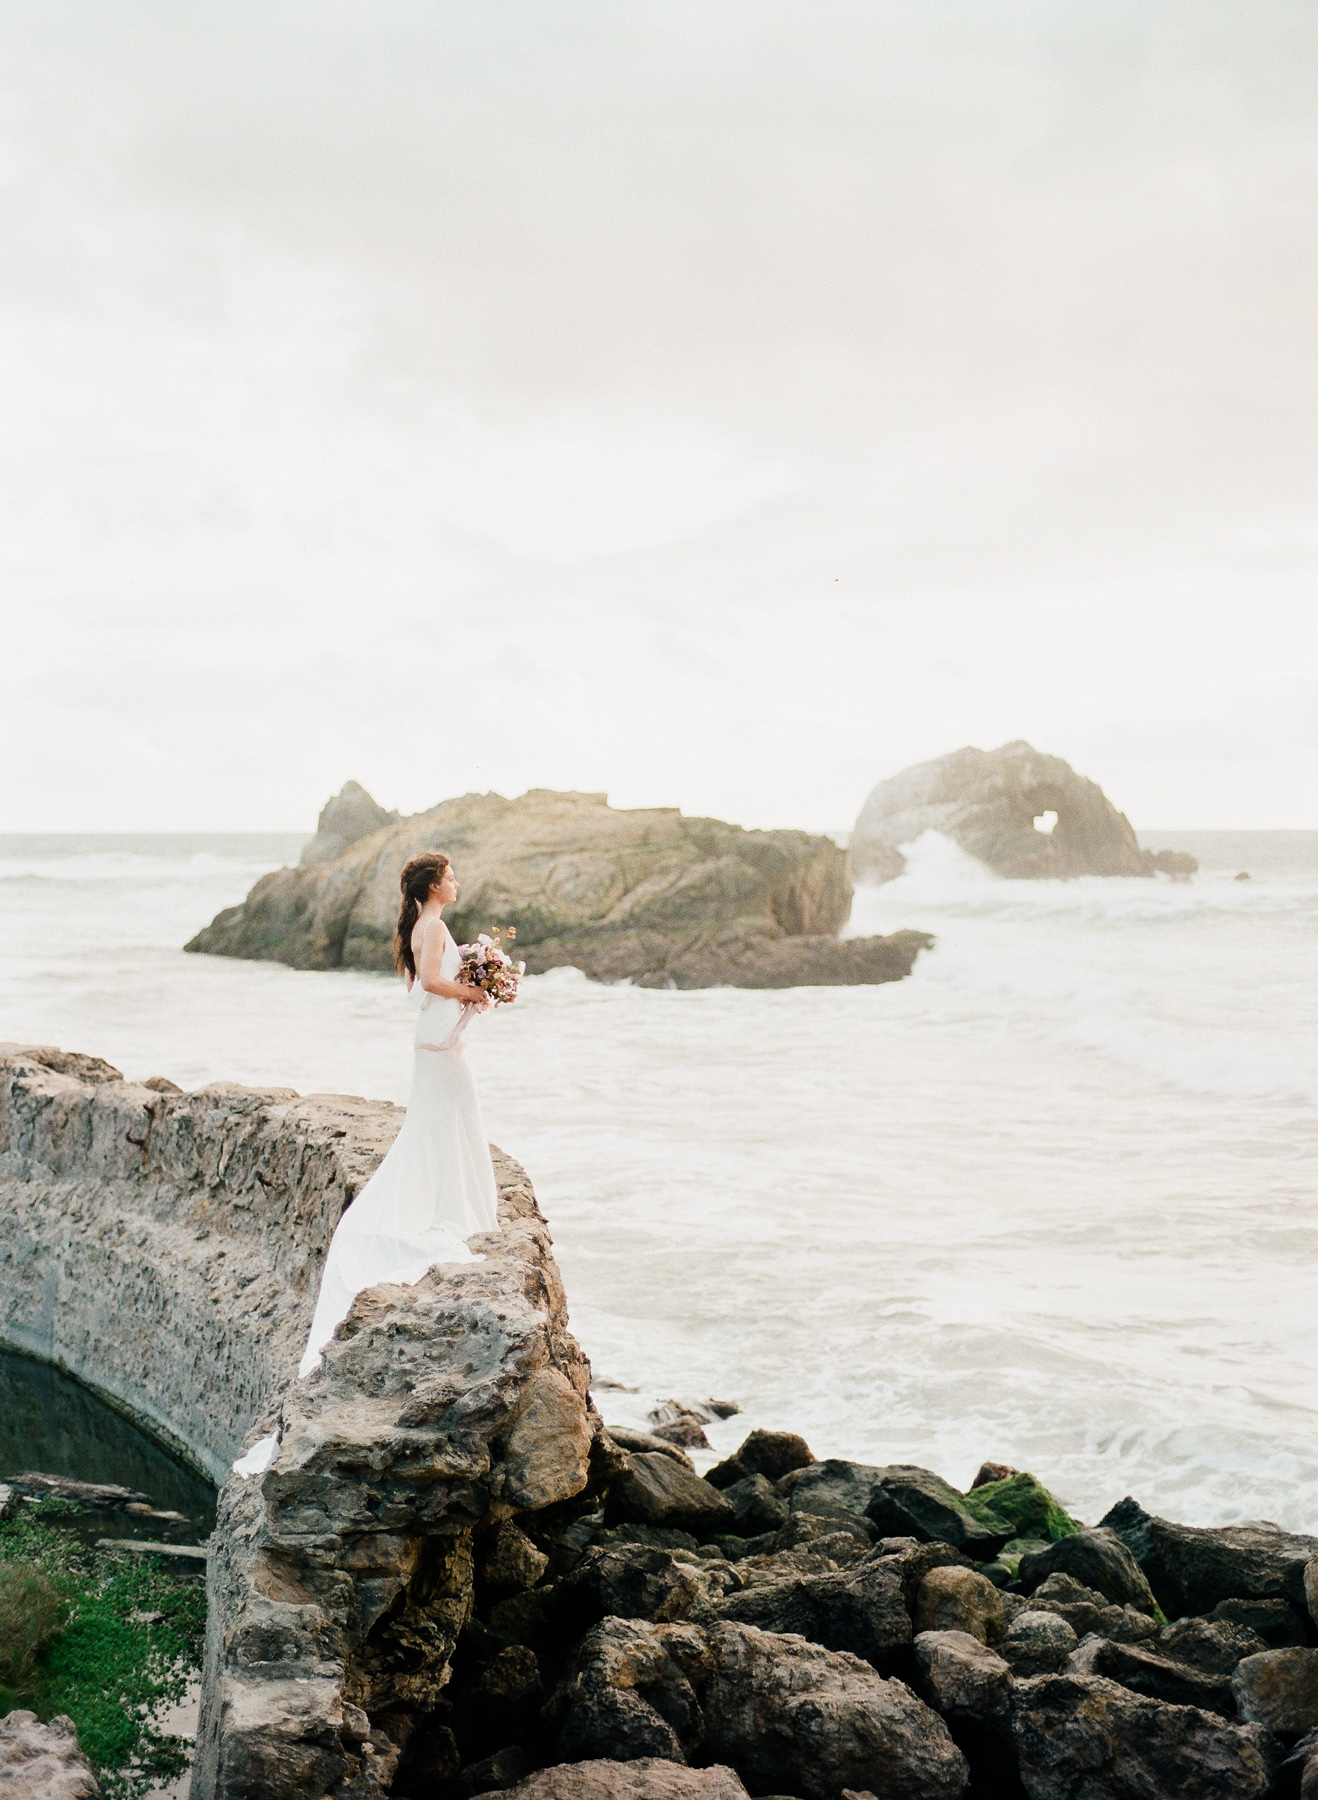 San-Francisco-Wedding-Film-Photography-31.jpg